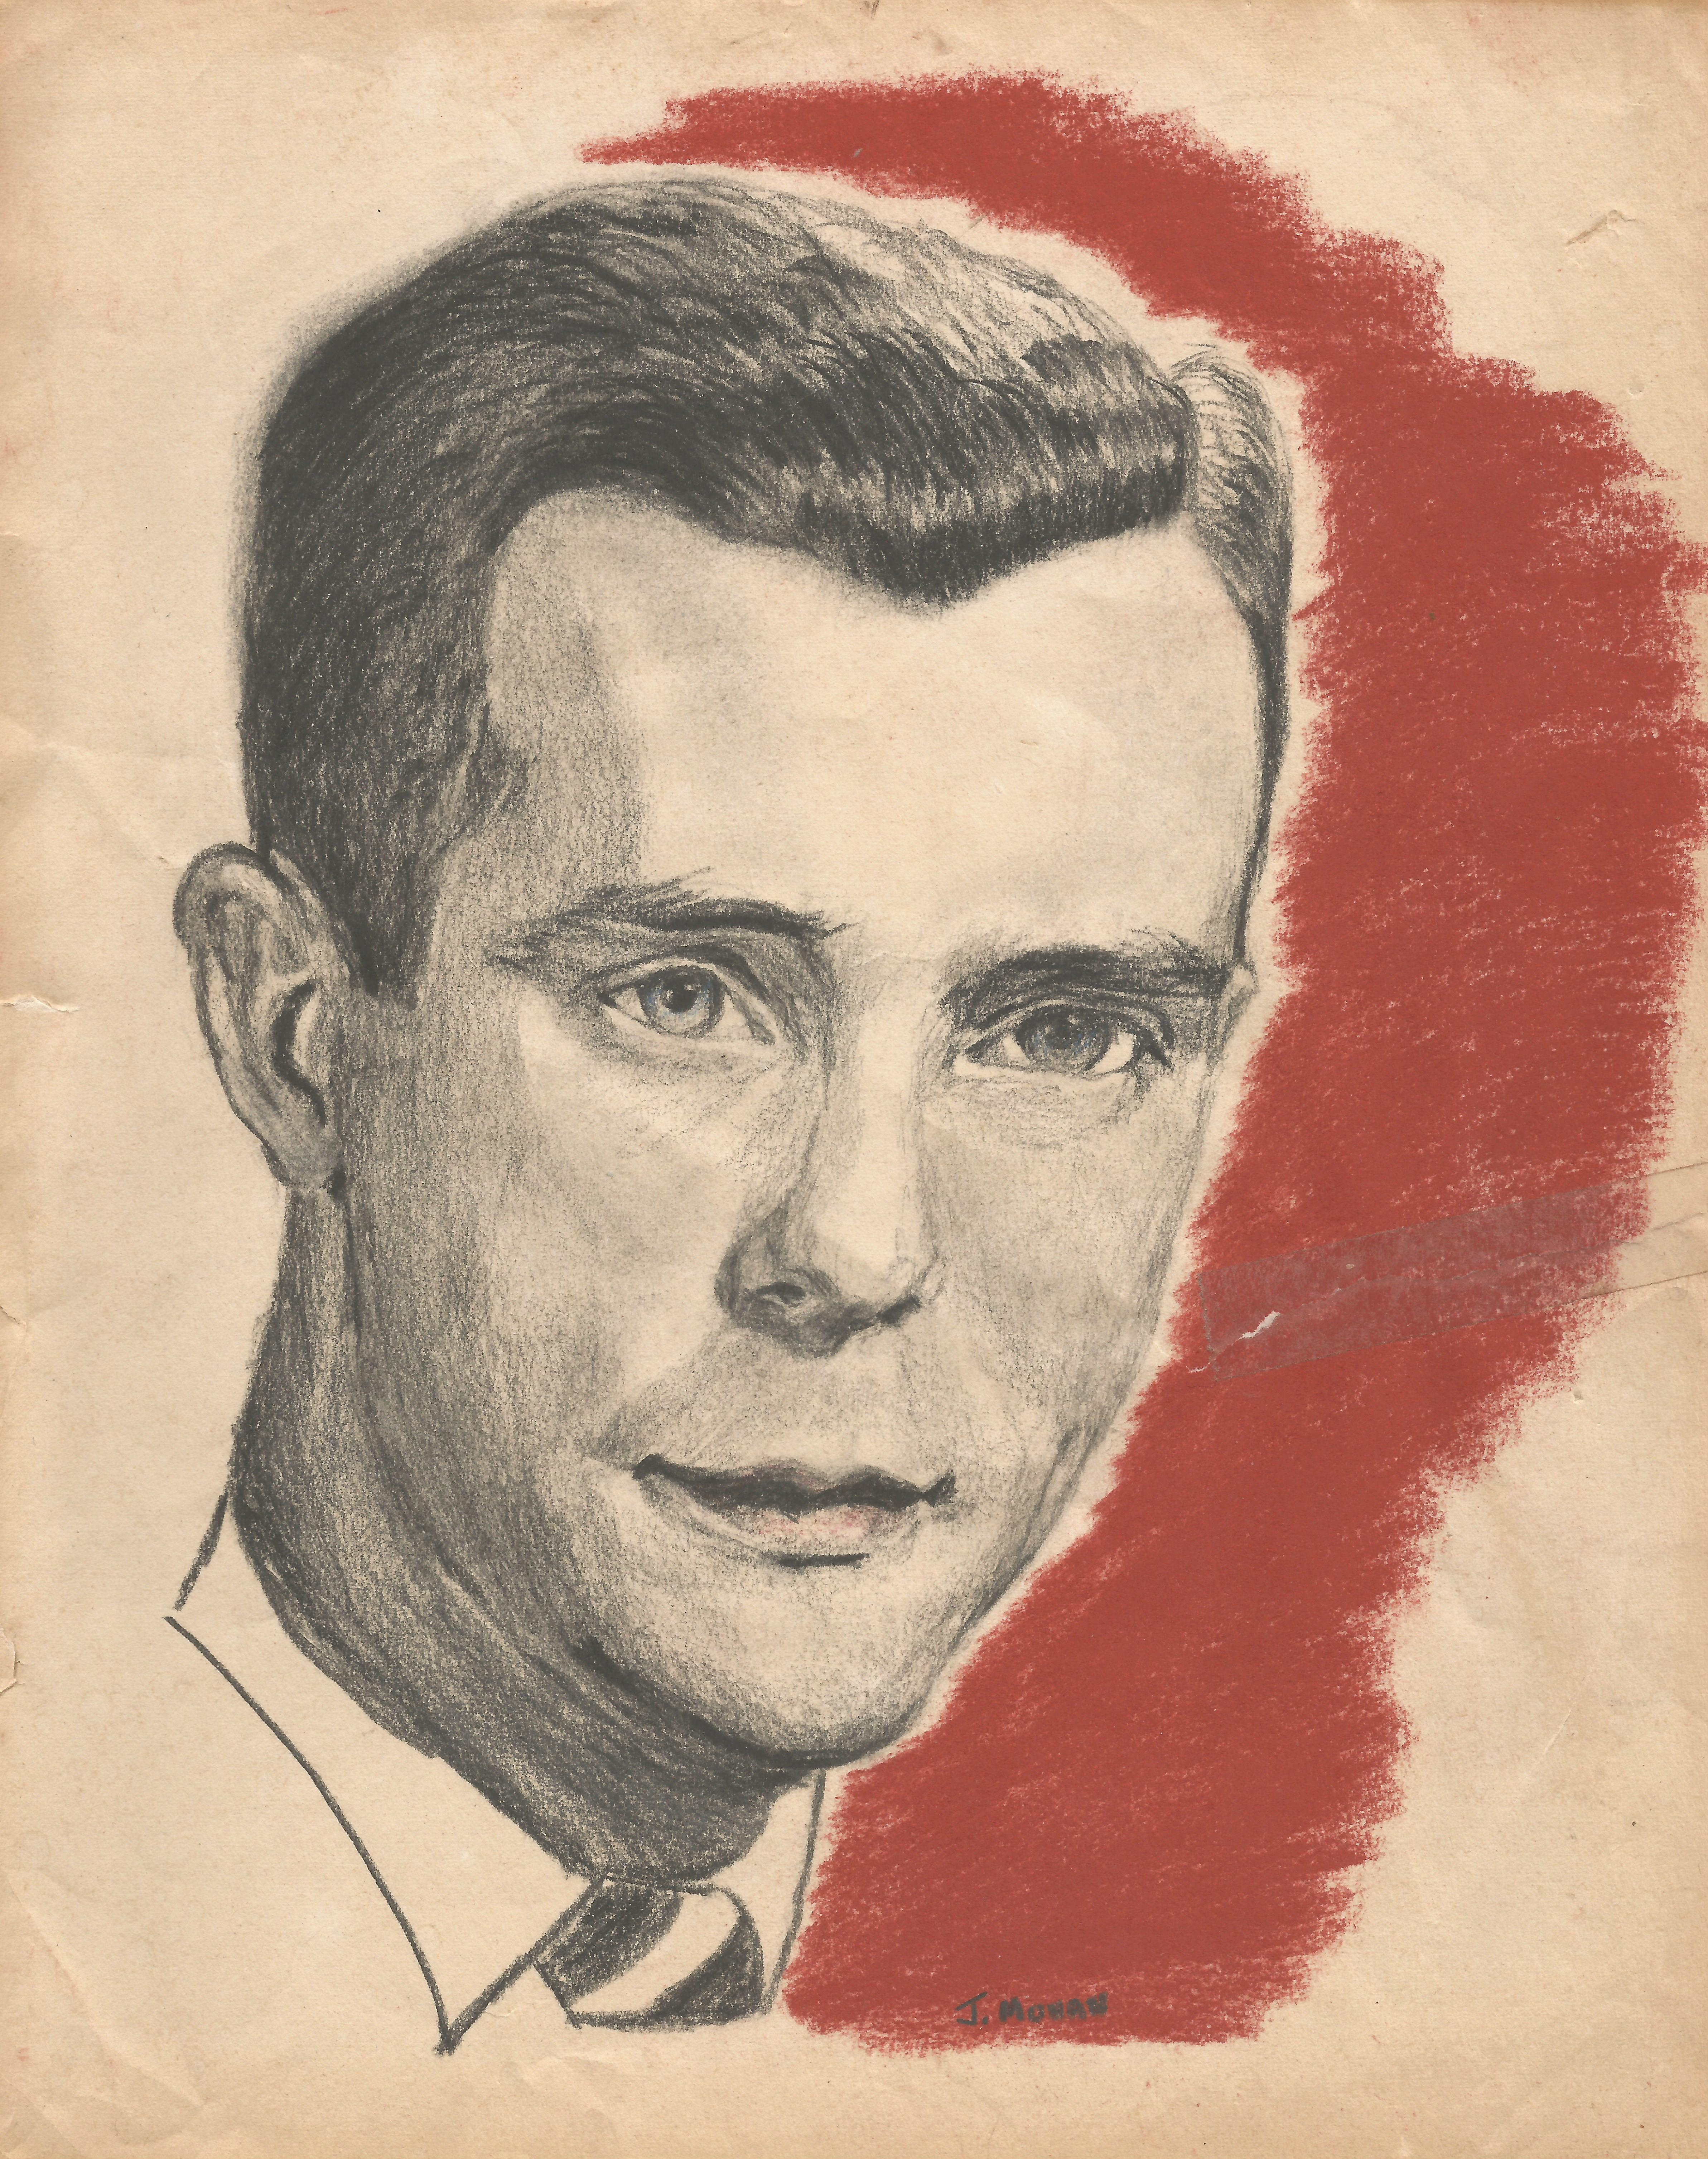 Arthur G. Mohan